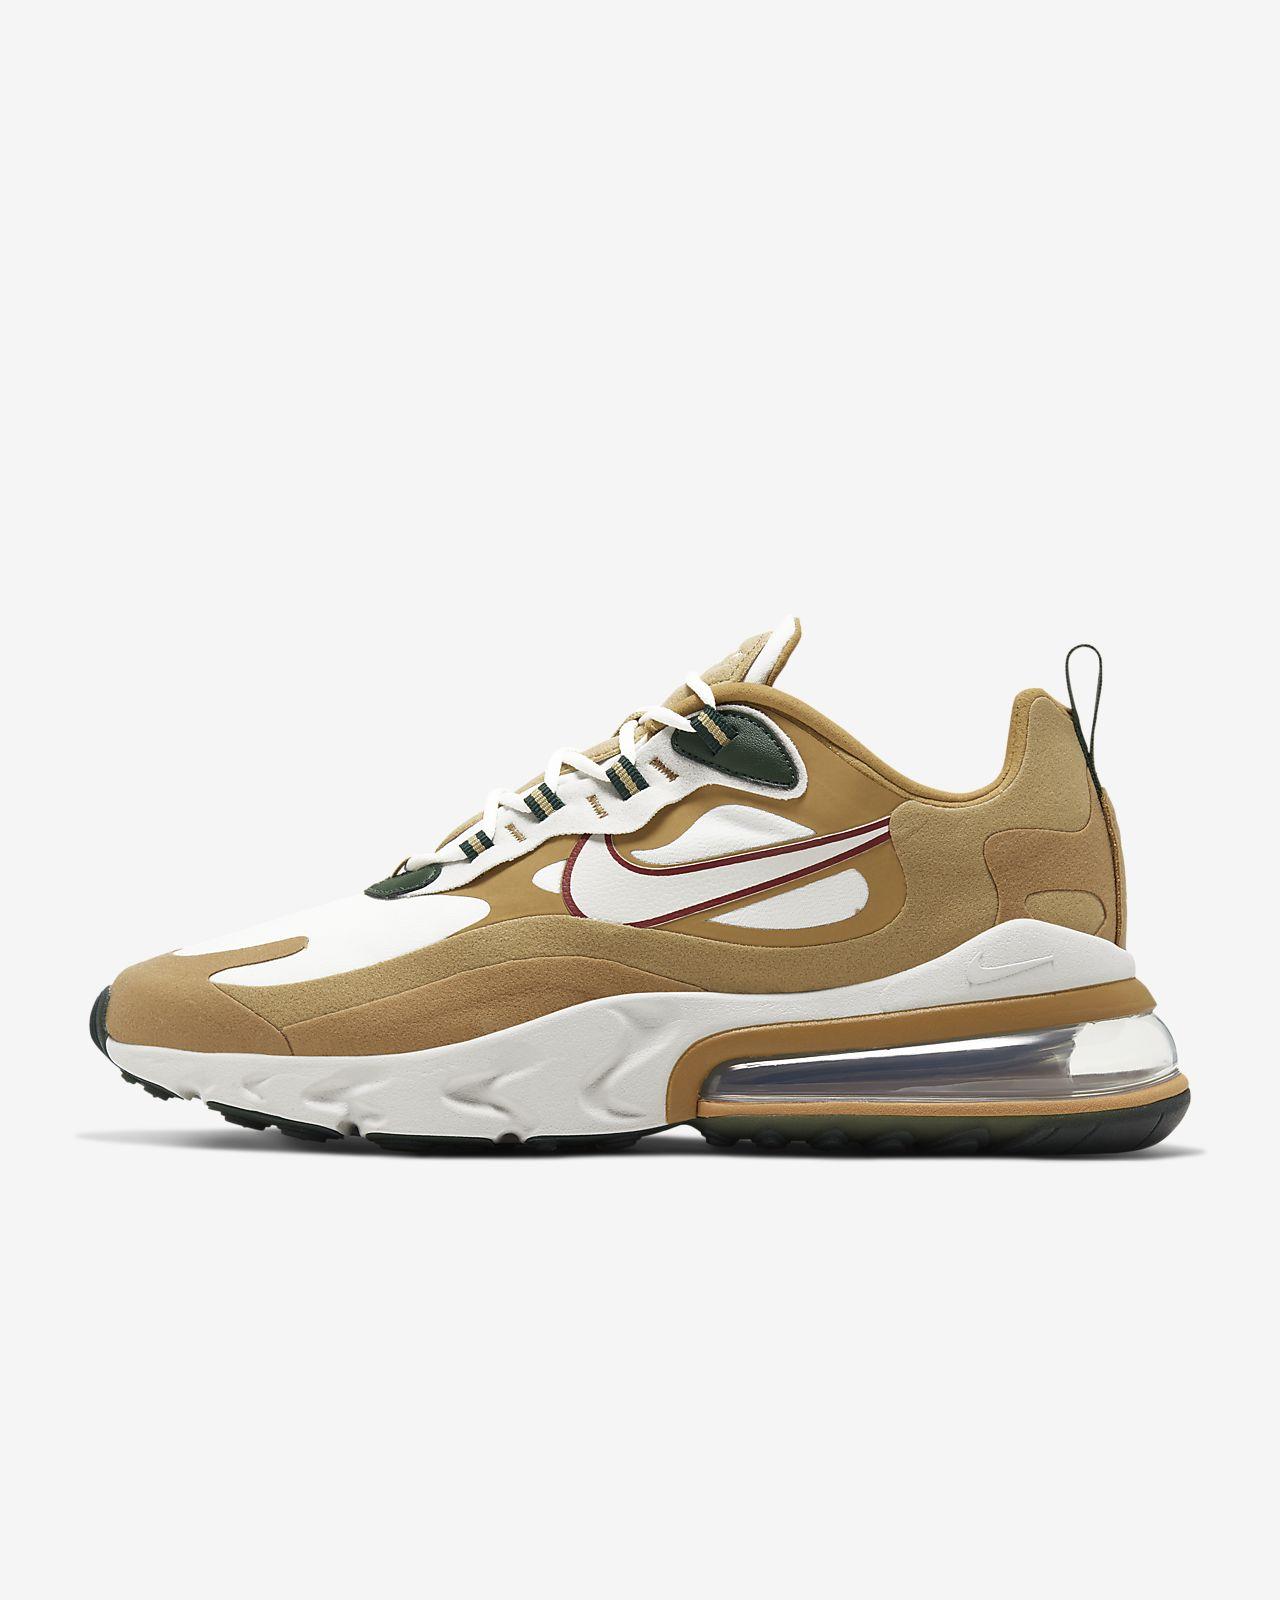 Nike Air Max 270 React (Reggae) Men's Shoes